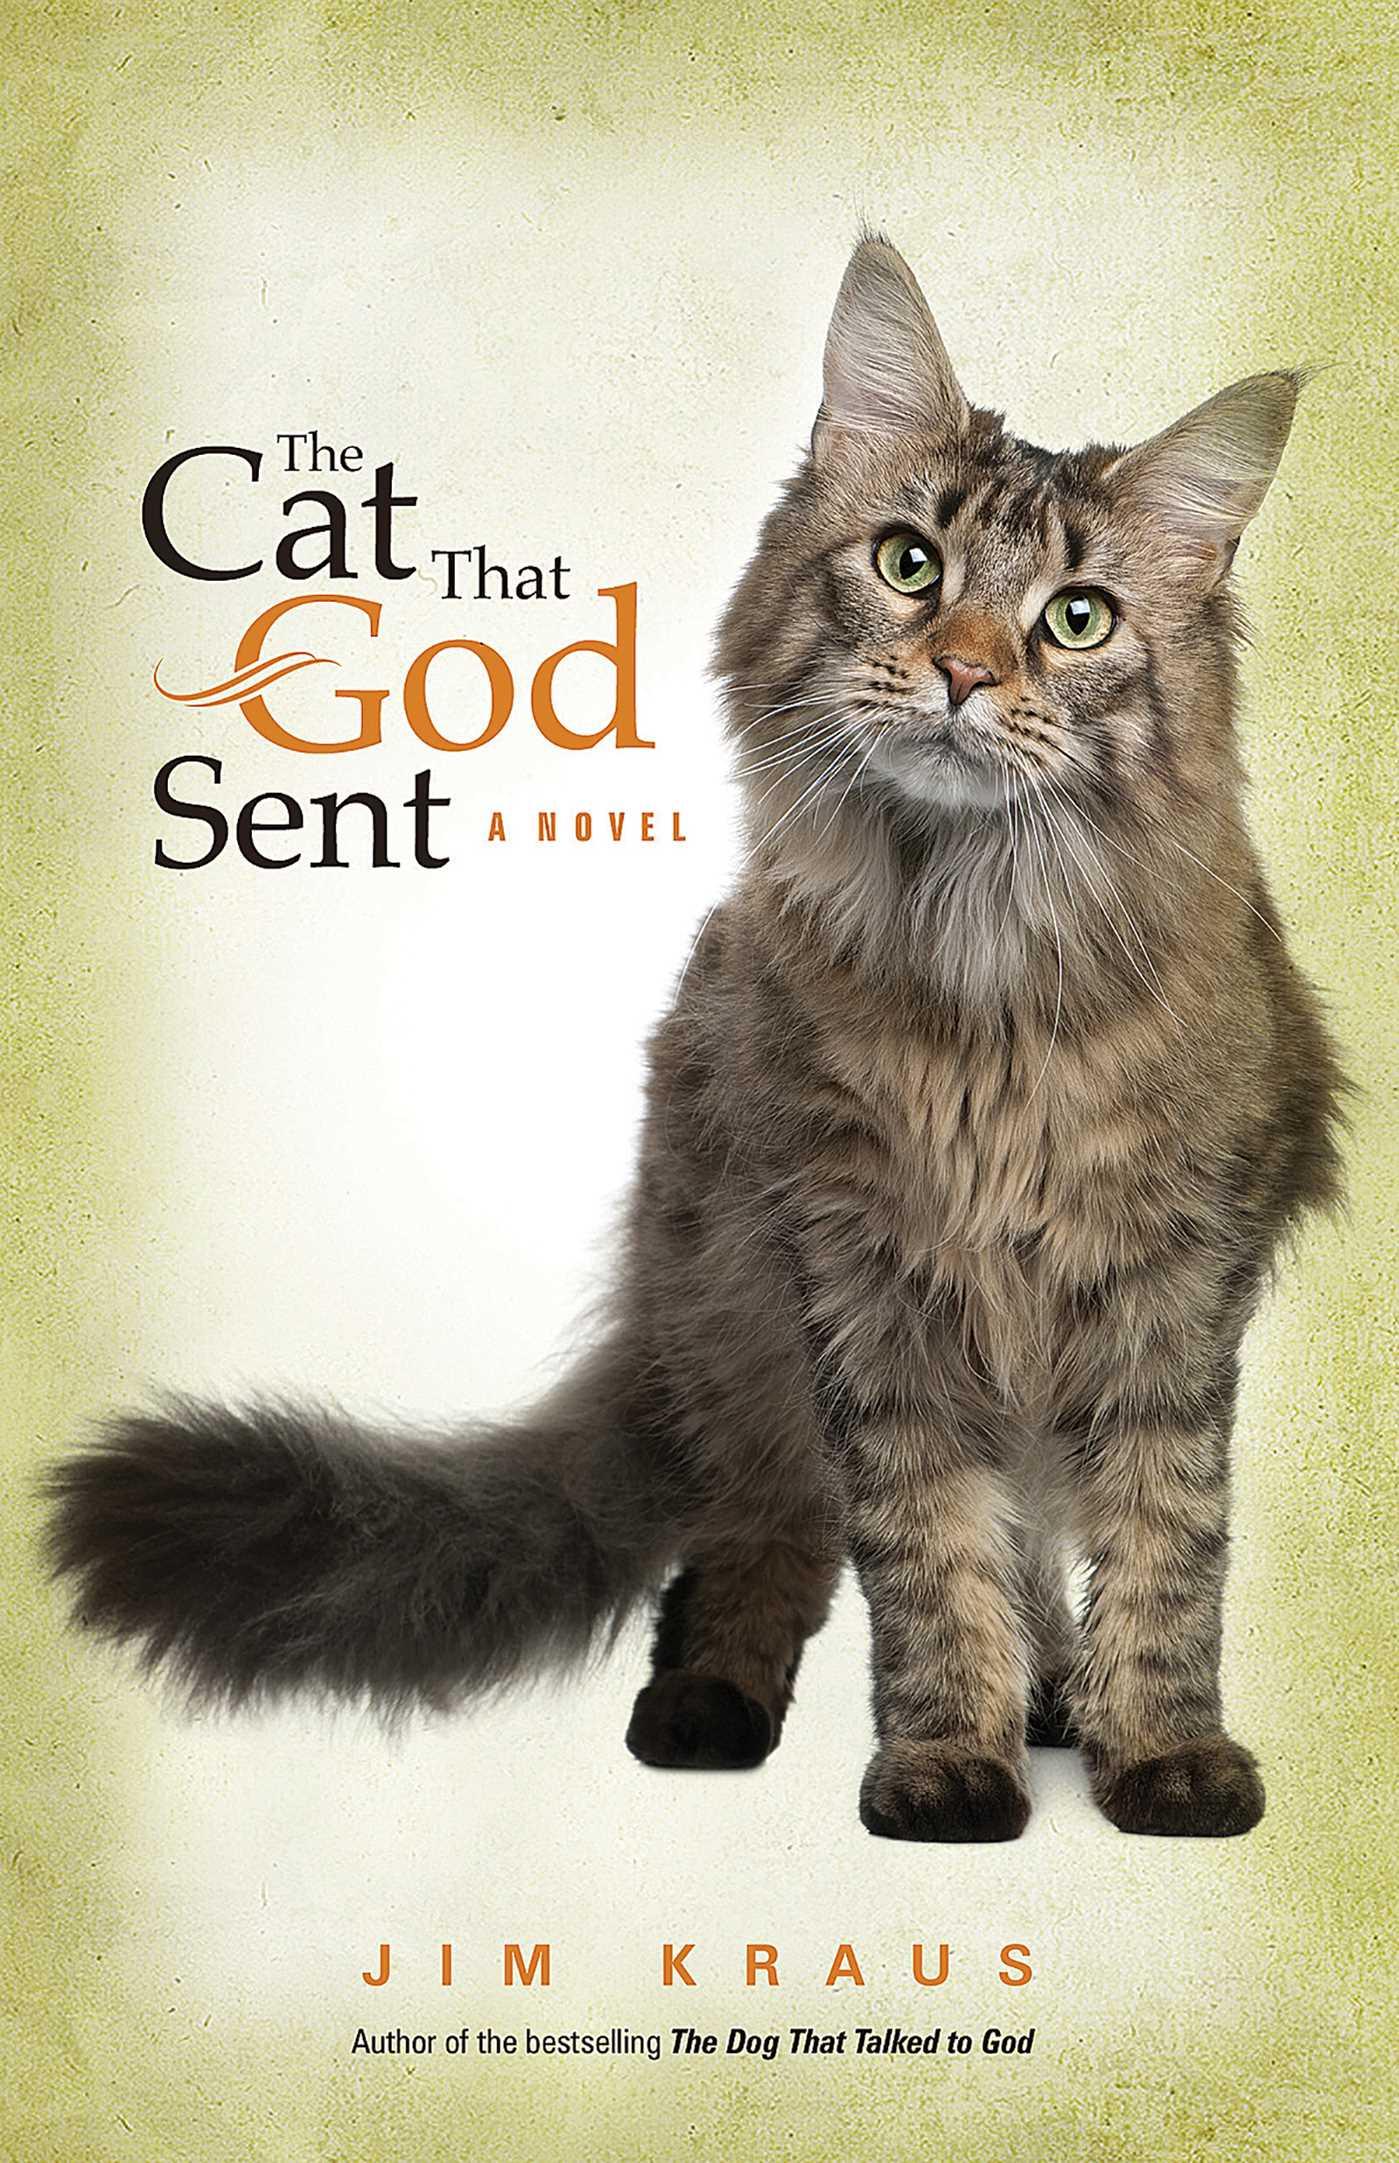 The cat that god sent 9781682998342 hr